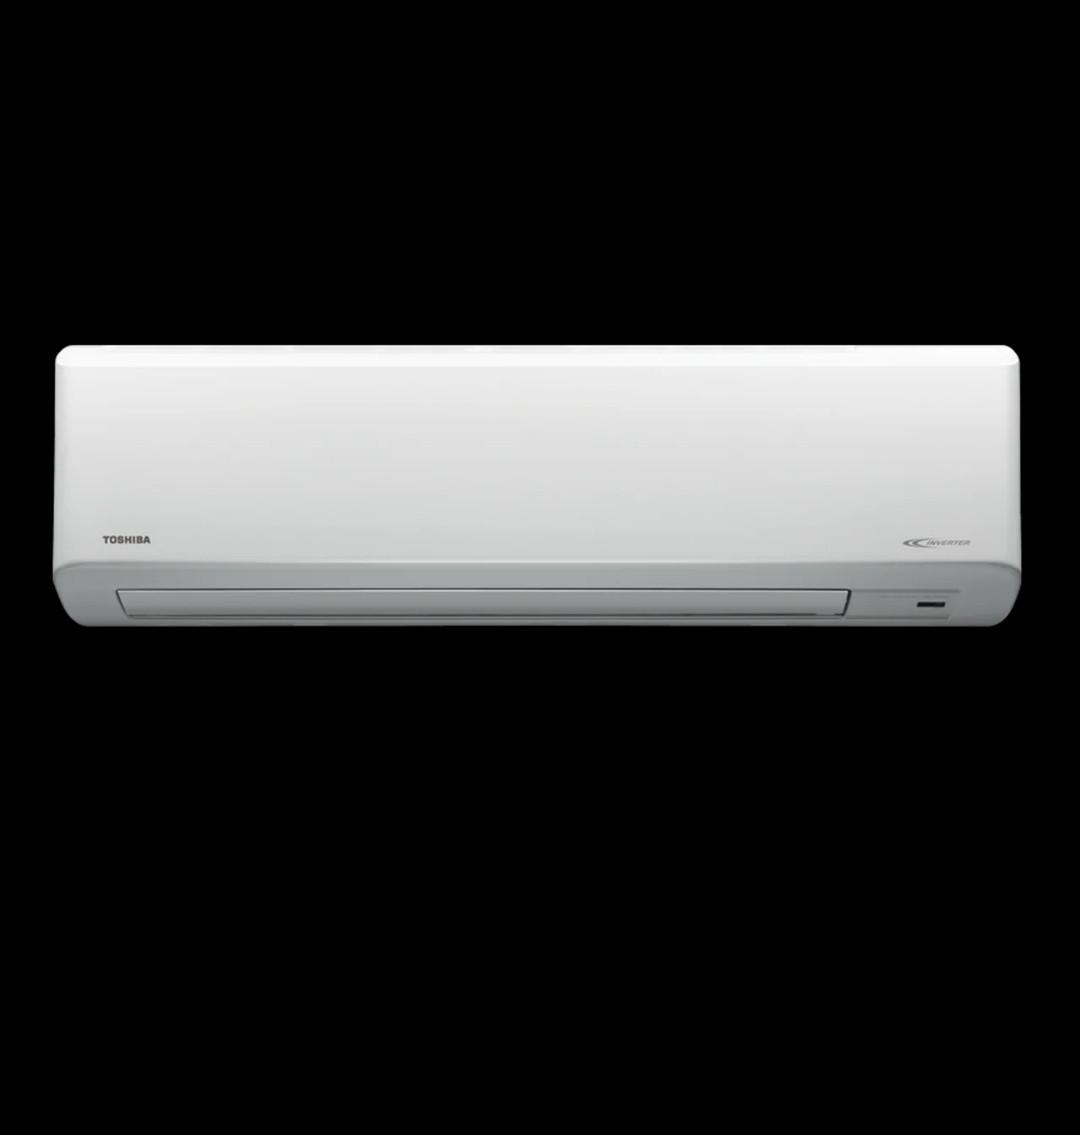 Кондиционер Toshiba RAS-10N3KV-E/RAS-10N3AV-E Белый (0101010804-000419228)